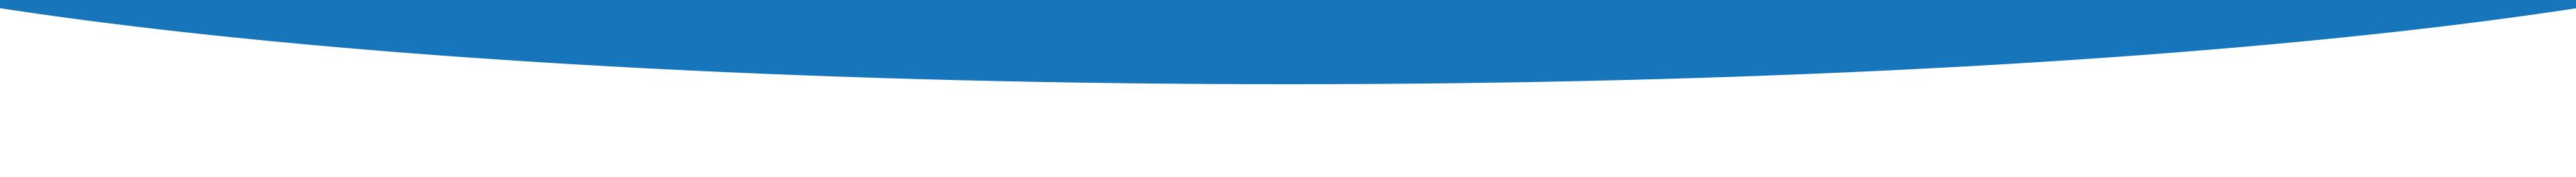 swoosh-blue-top-on-white-convex